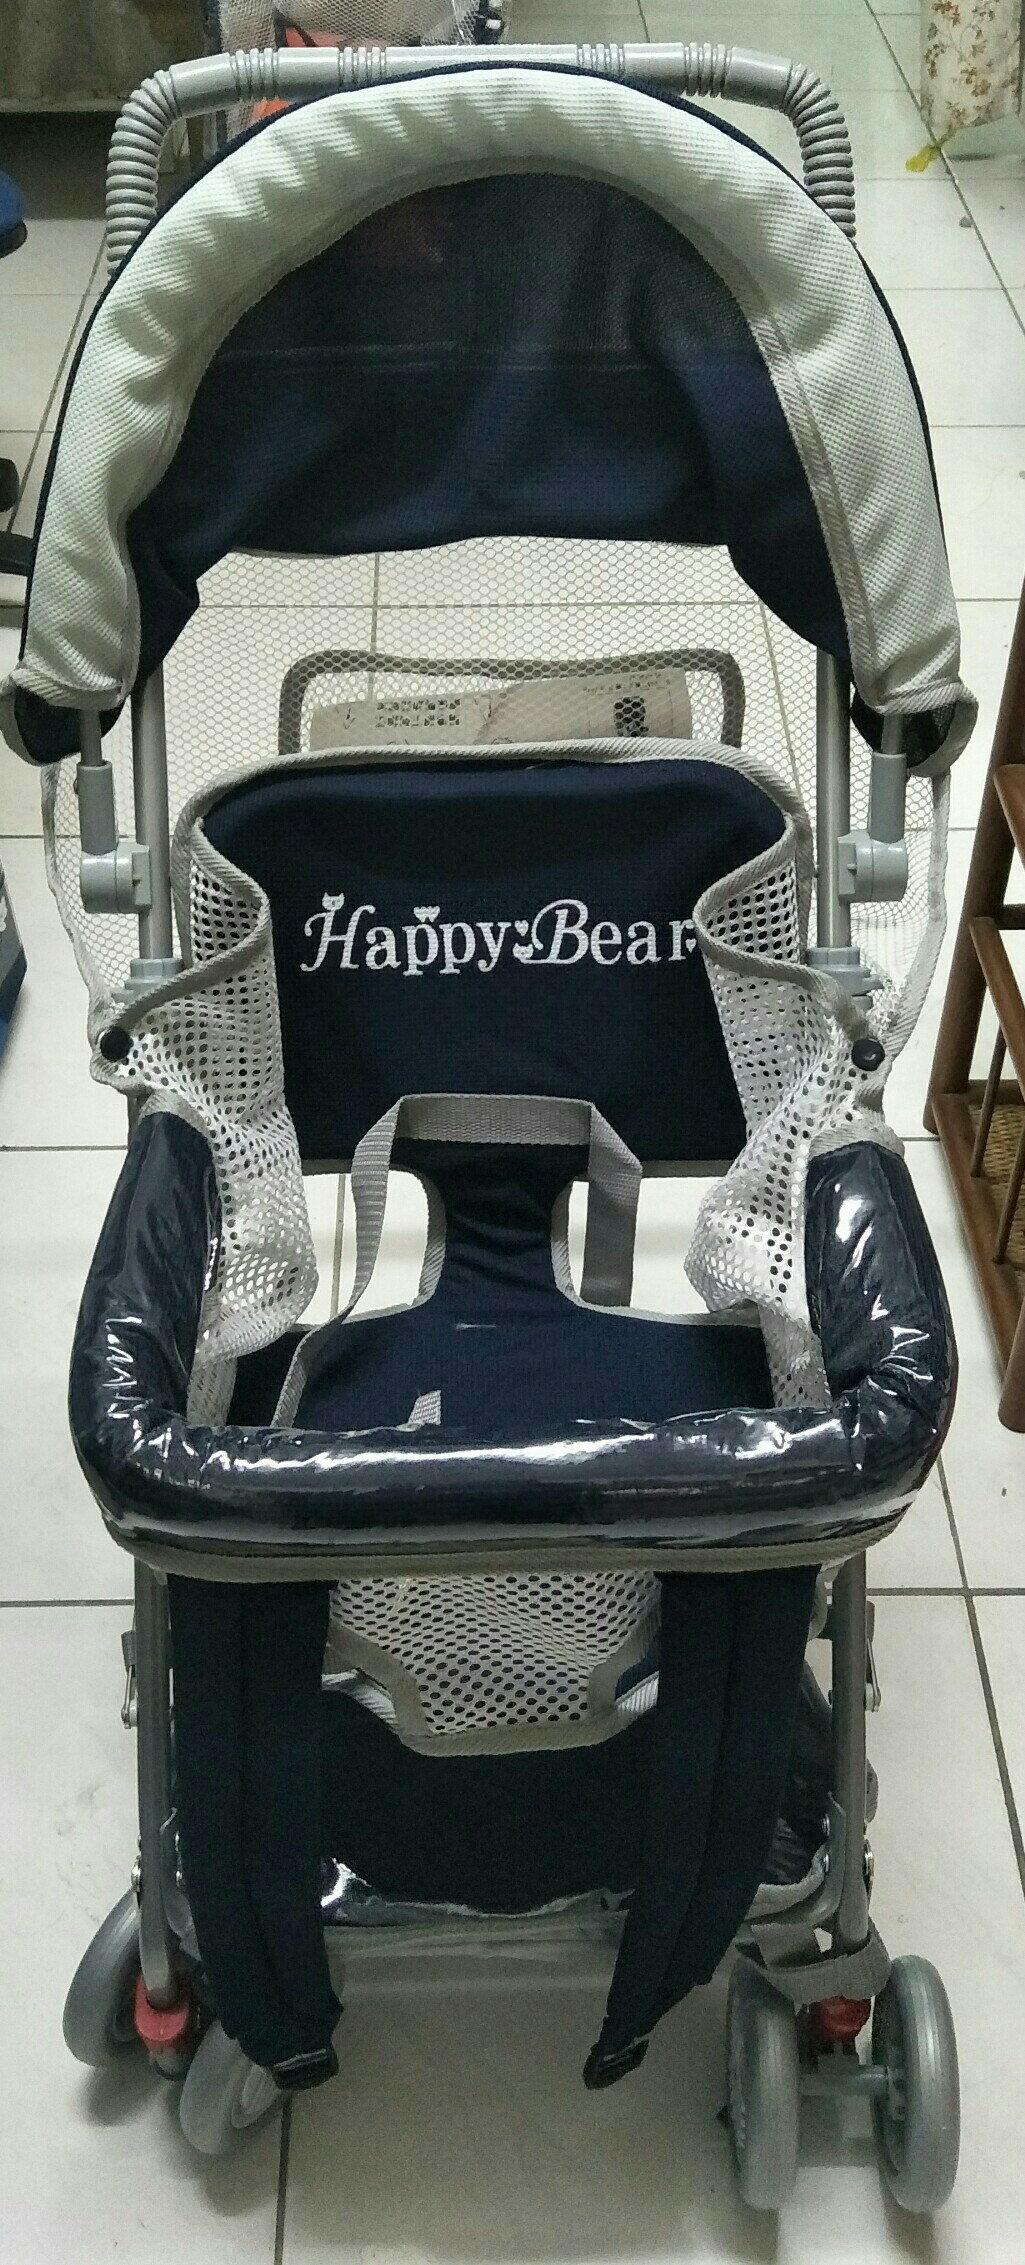 Happy Bear手推嬰幼兒車/可推式機車椅 CH-923  (深藍/酒紅/藍)